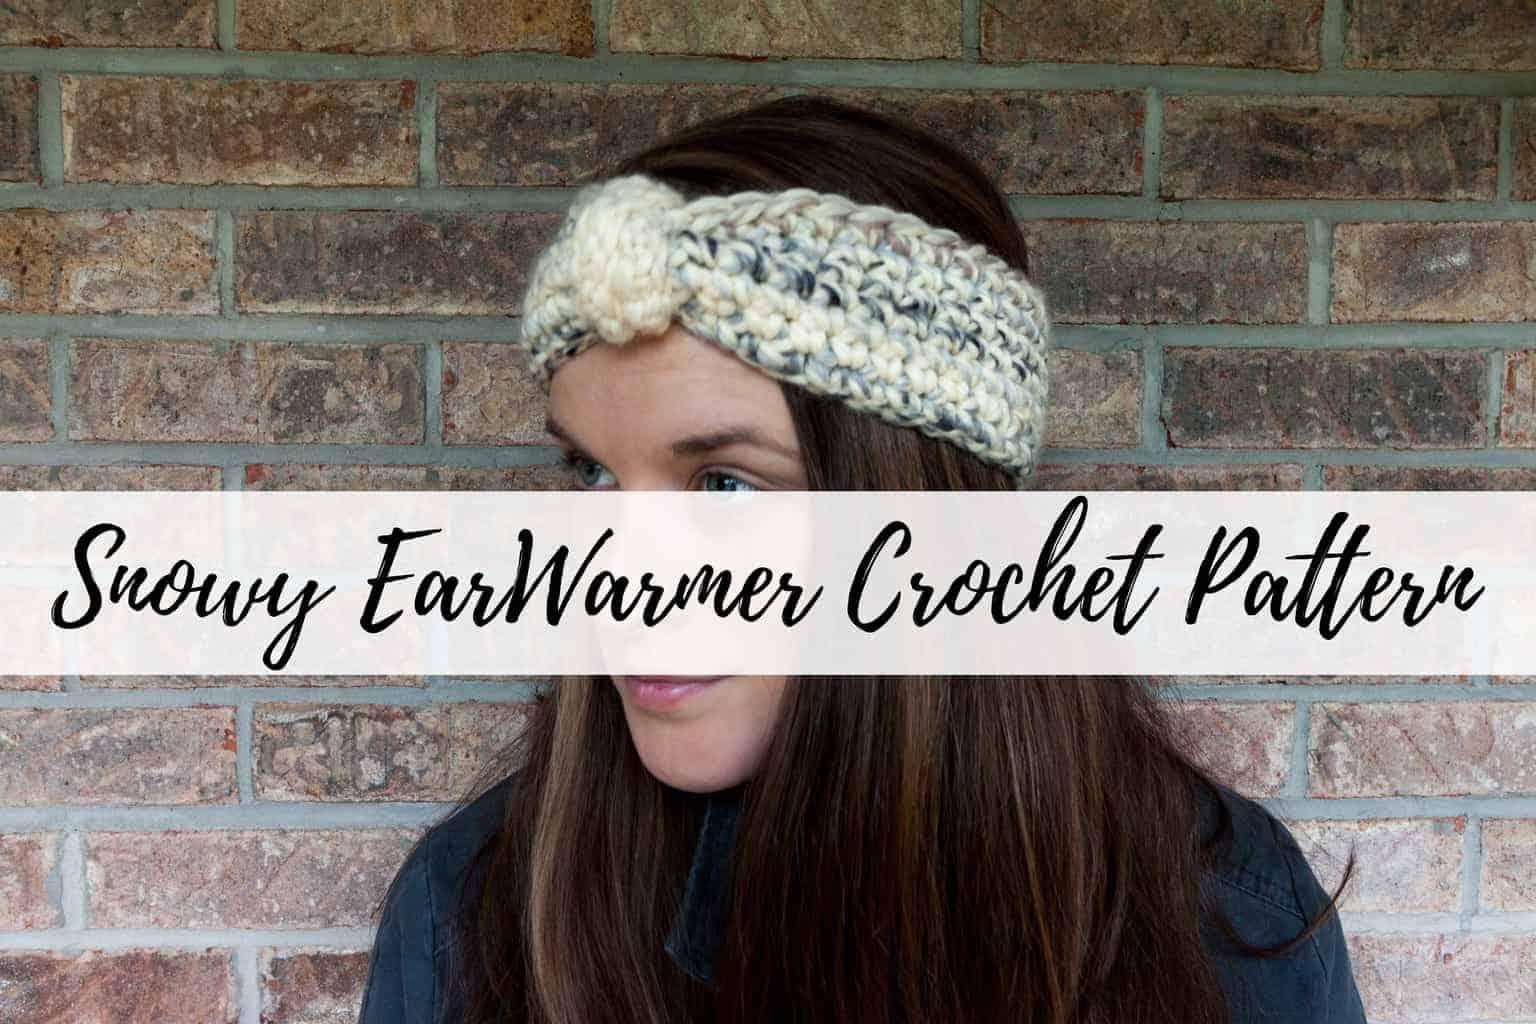 Snowy Crochet Earwarmer Pattern by Rescued Paw Designs - Make this easy beginner friendly pattern today!